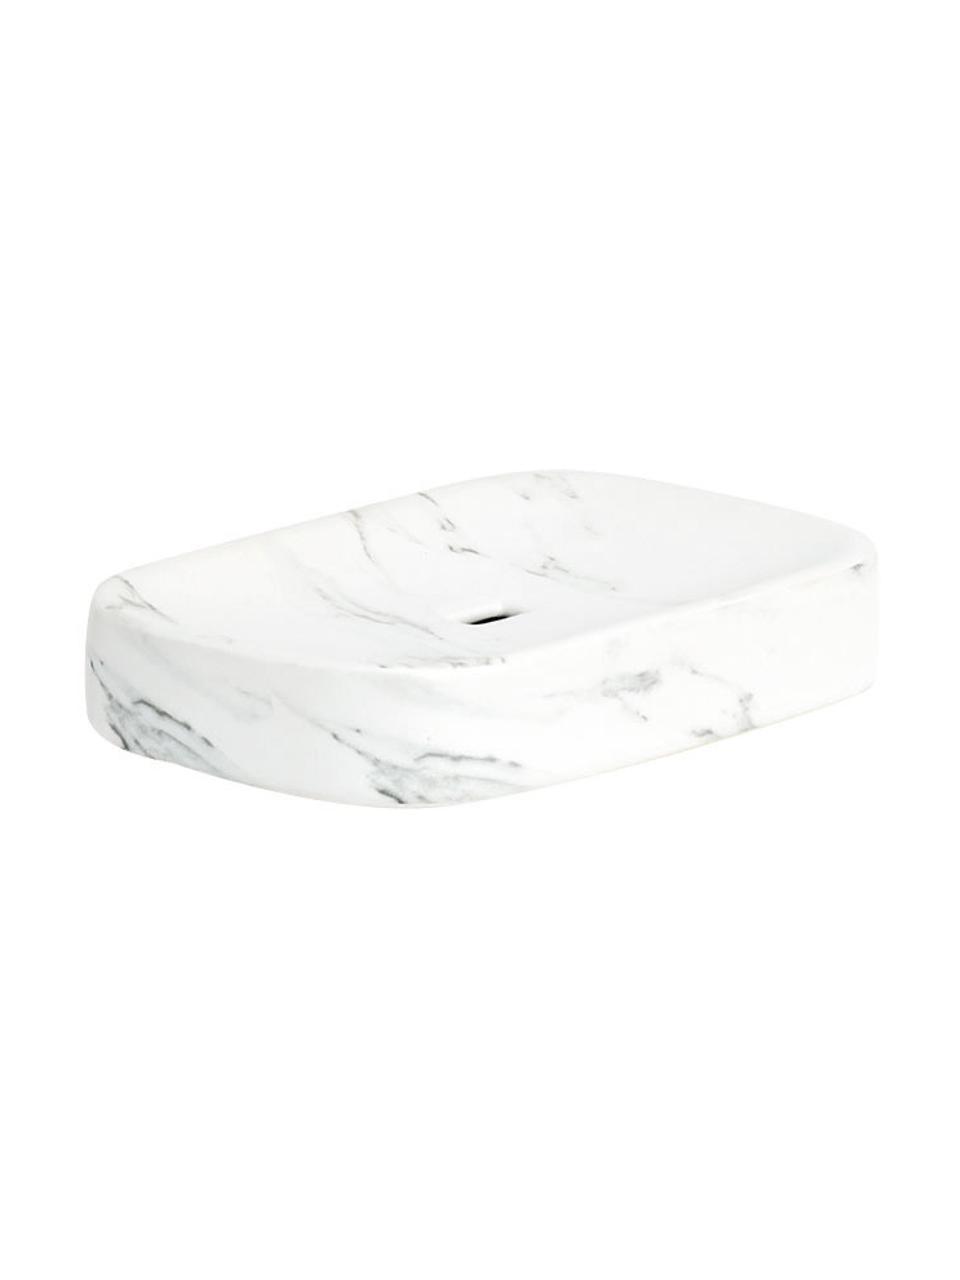 Seifenschale Marble aus Keramik, Keramik, Weiß, 13 x 2 cm